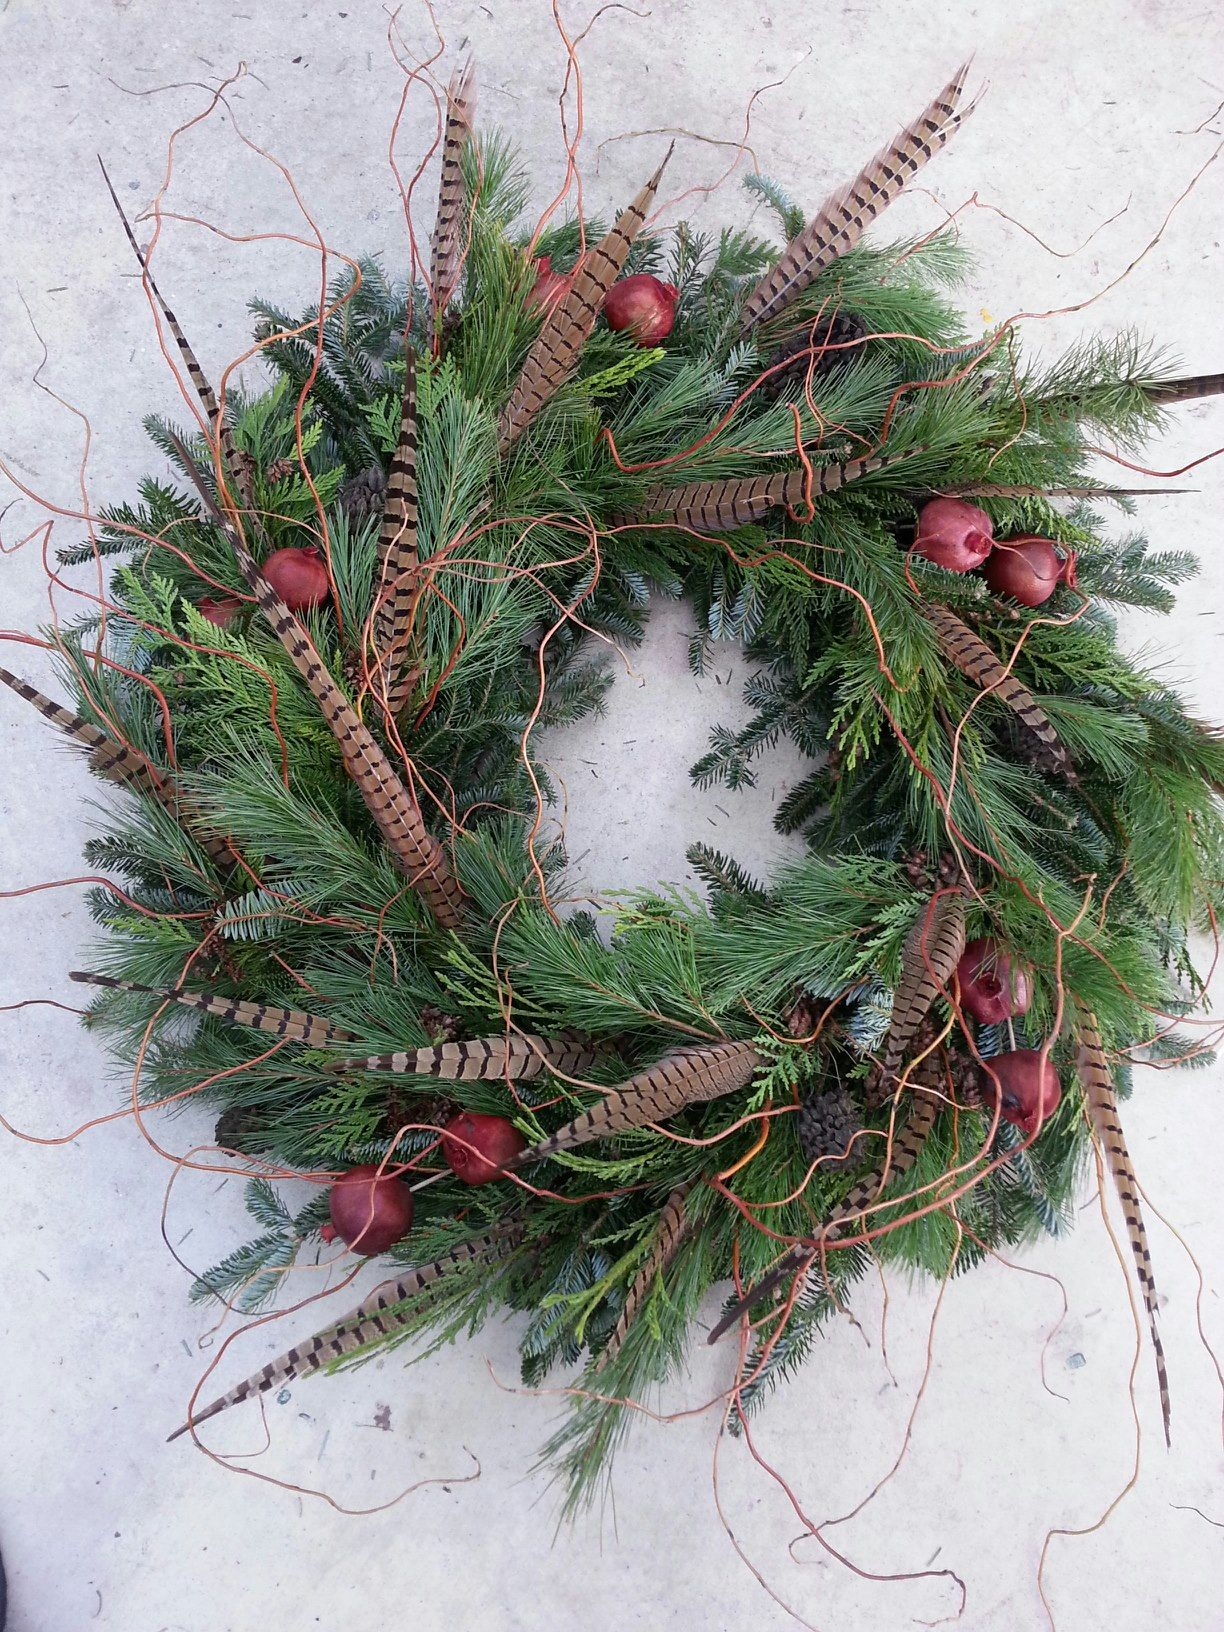 Custom Christmas Wreath  Pheasant Feathers, Pomegranate, Mixed Cedar, And